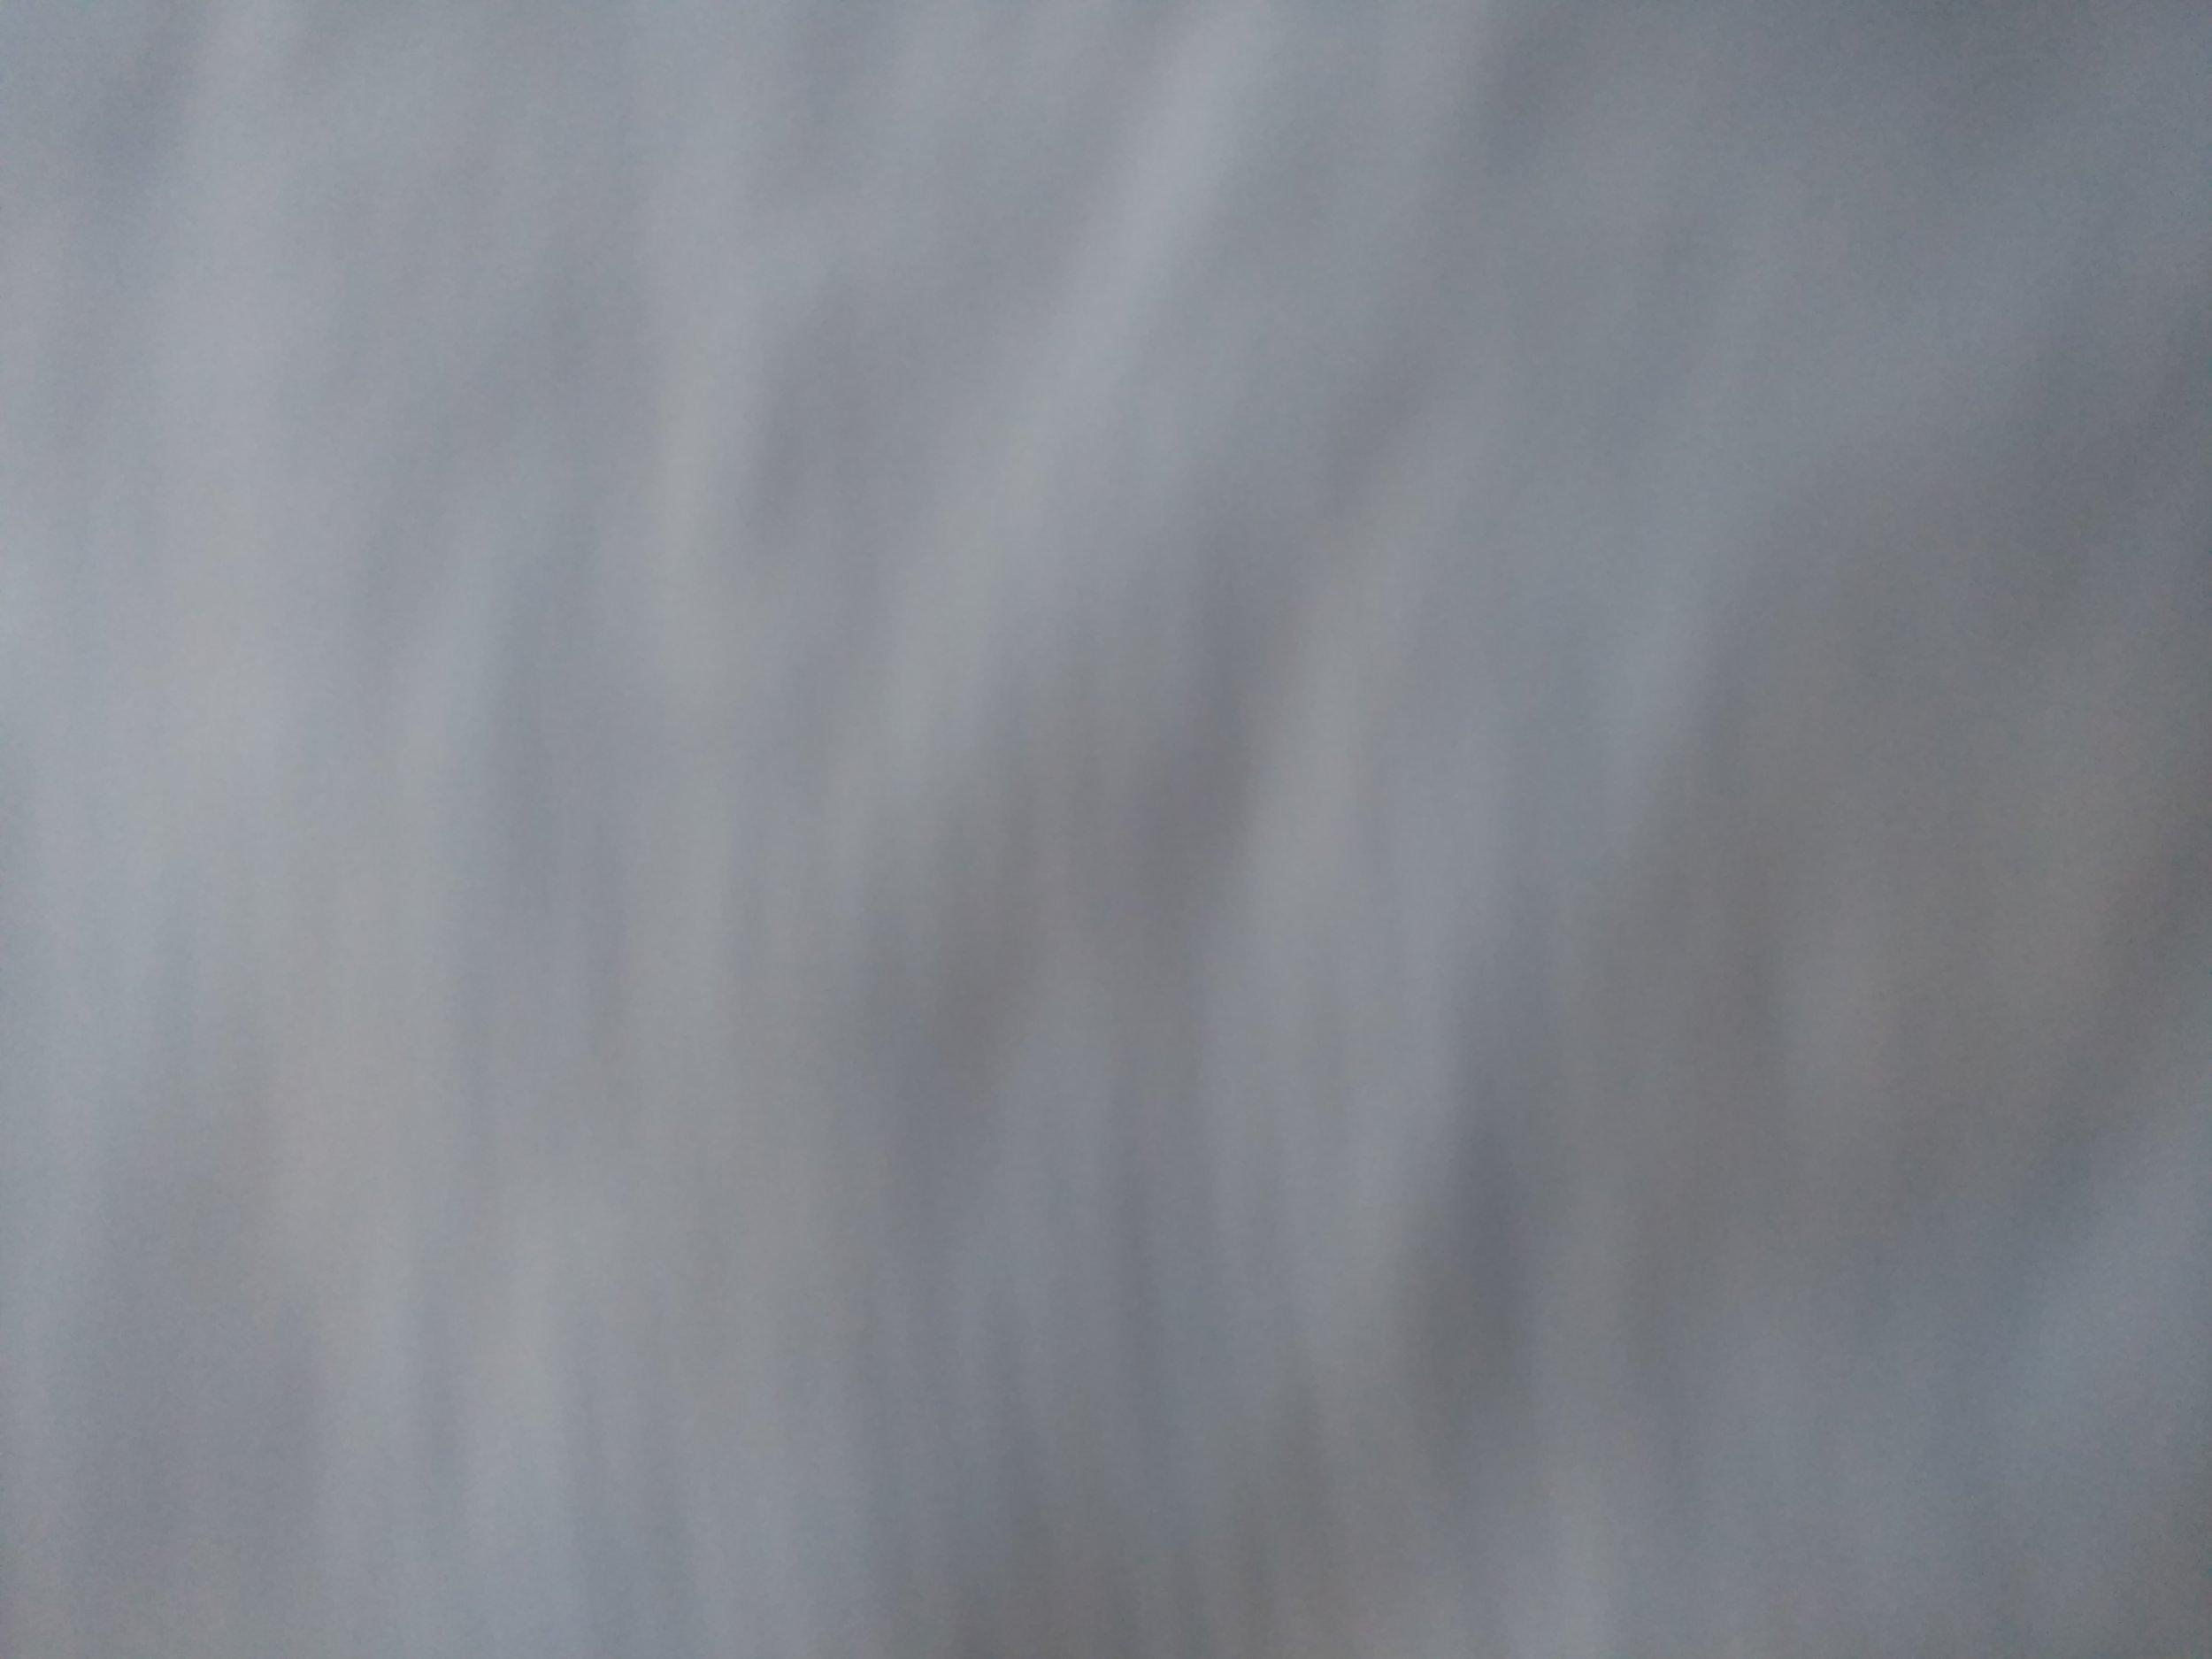 willroth-co-free-texture-gradient-053.jpg